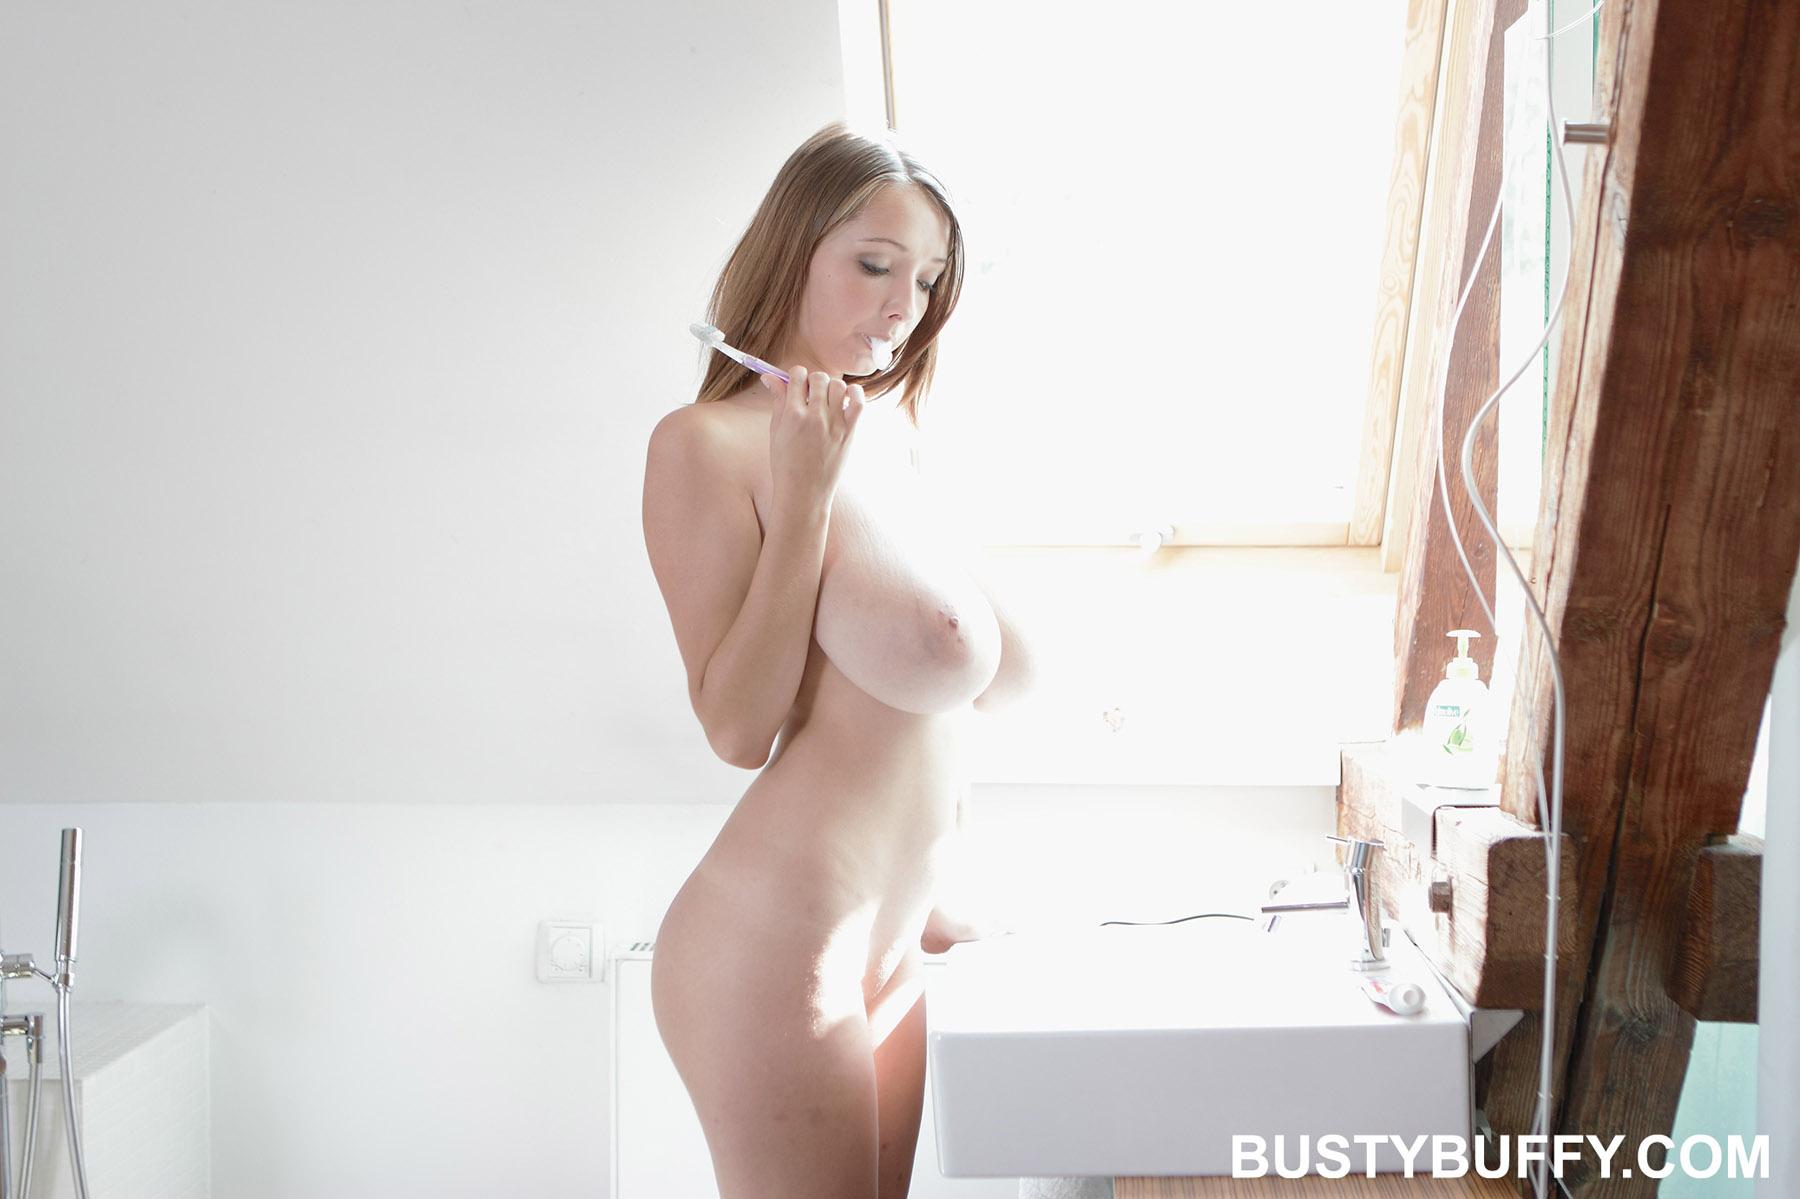 Cucchiaro recommends Nikki mudarris porn video